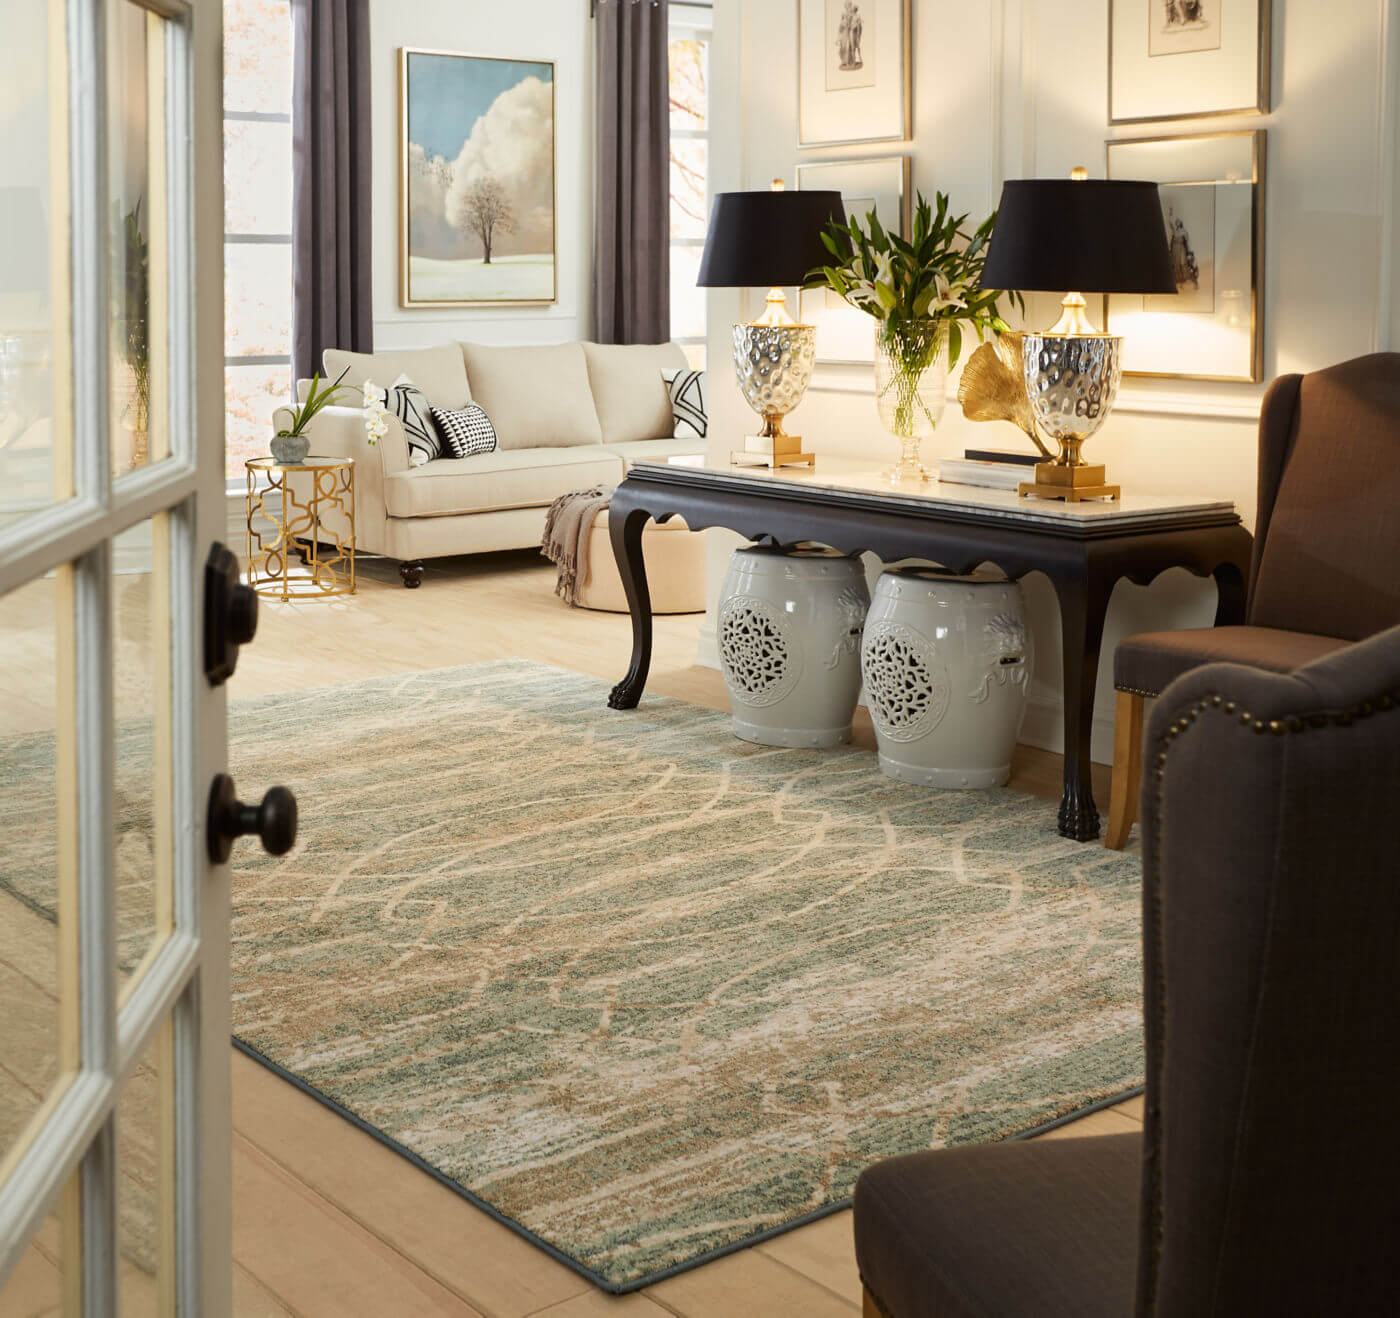 Living room interior | Shans Carpets And Fine Flooring Inc